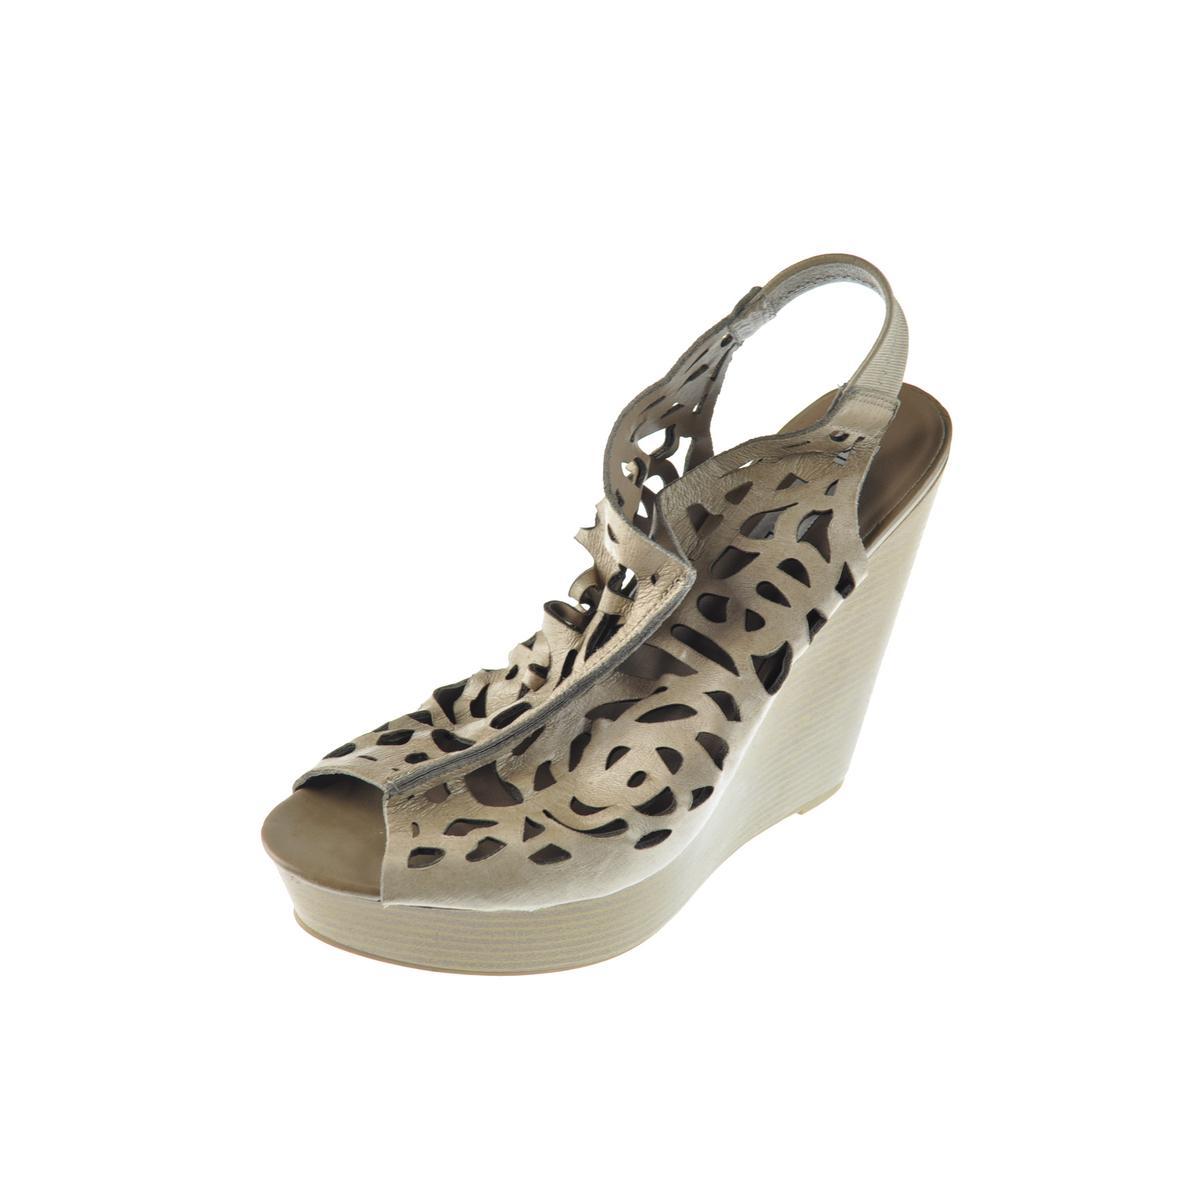 e1915ecea89 Details about Steve Madden Womens Gabel Taupe Leather Wedges Sandals 10  Medium (B,M) BHFO 1461